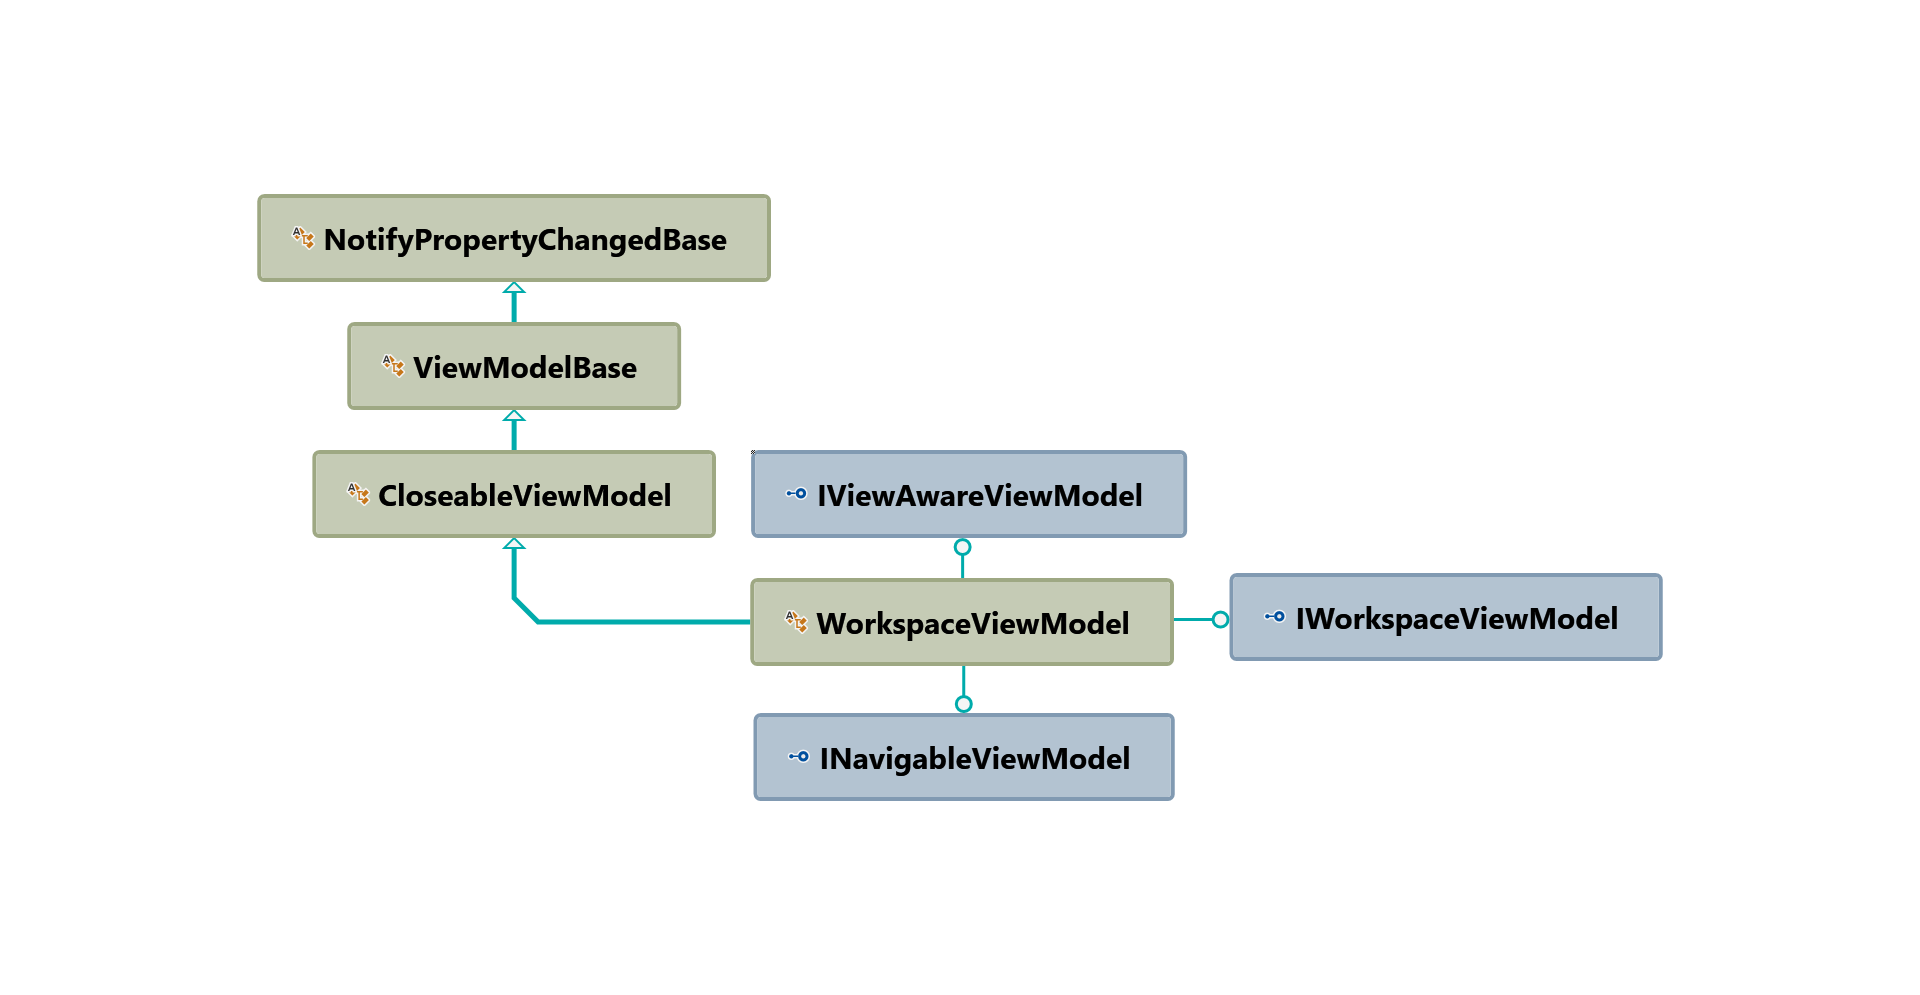 WorkspaceViewModel inheritance hierarchy diagram